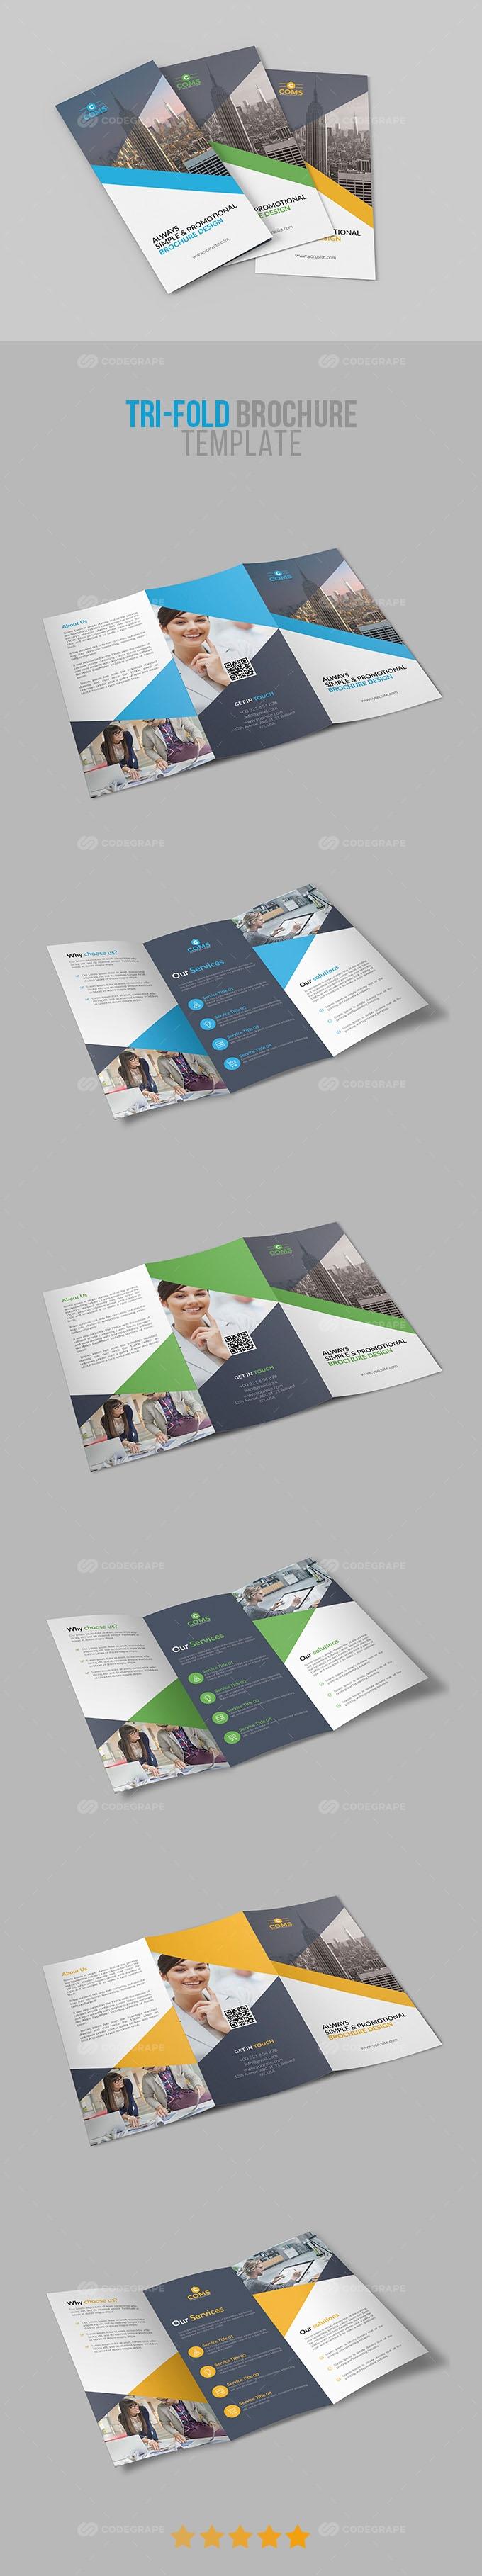 Corporate Tri-Fold Brochure Template 01